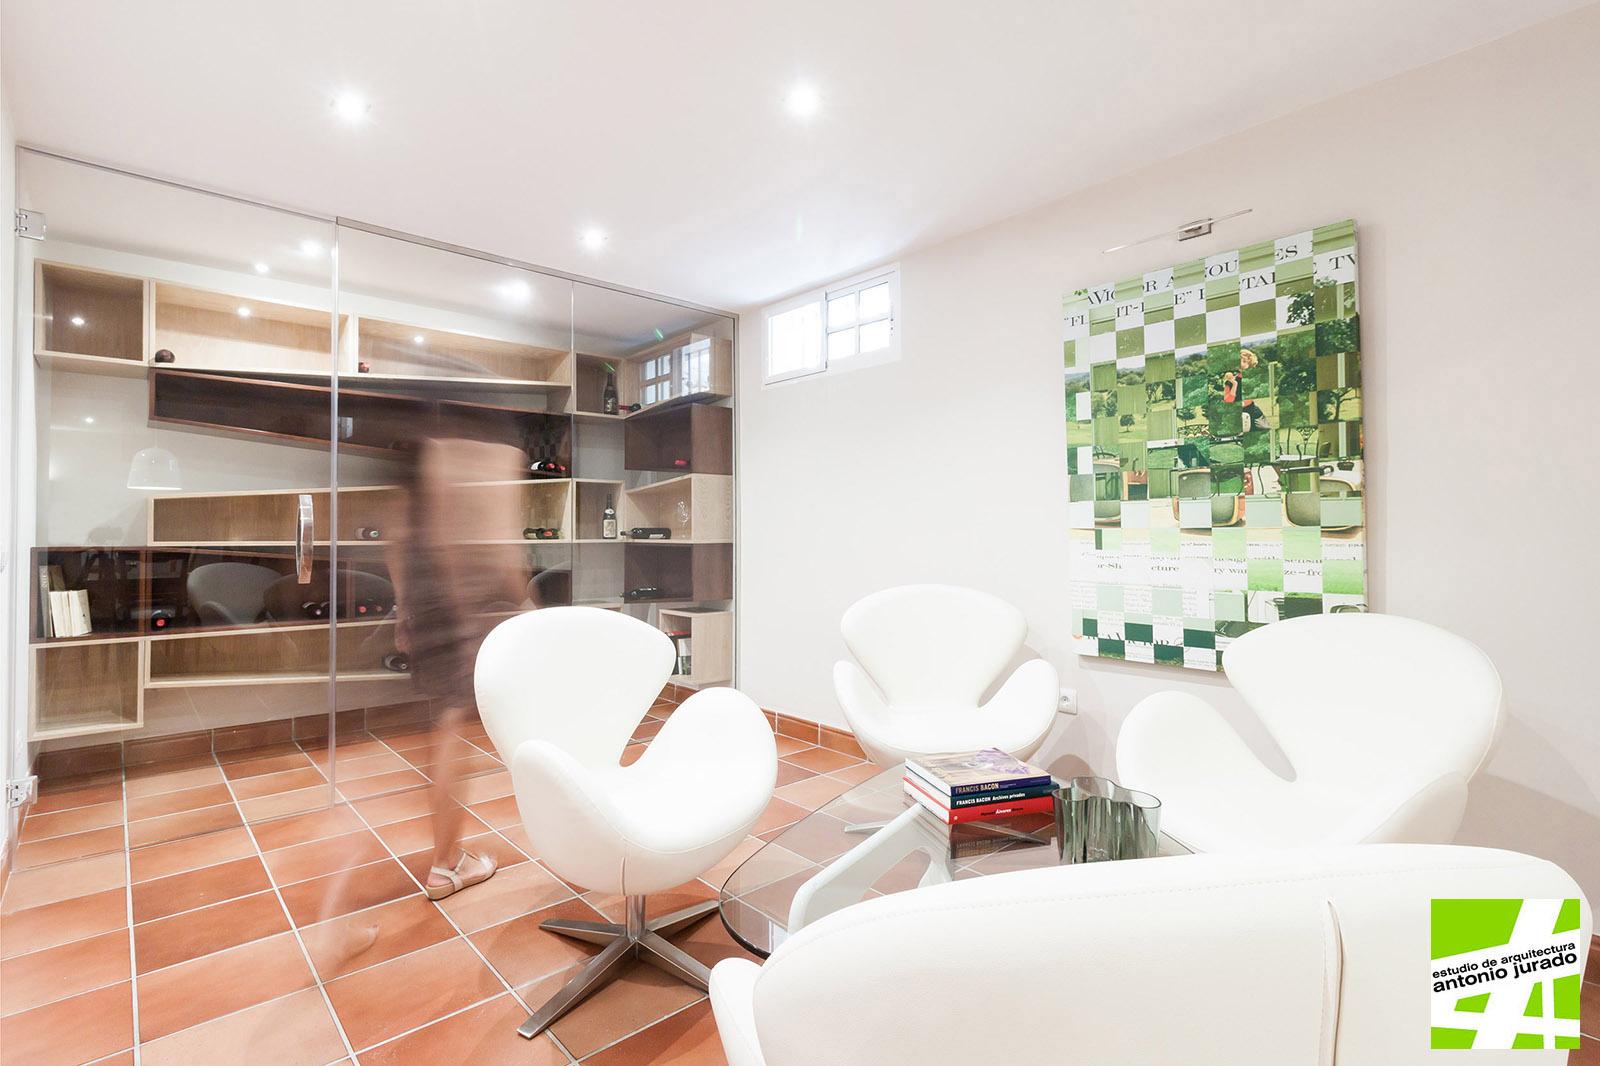 interiorismo-reforma-diseño-vivienda-torrox-park-malaga-antonio-jurado-arquitecto-03